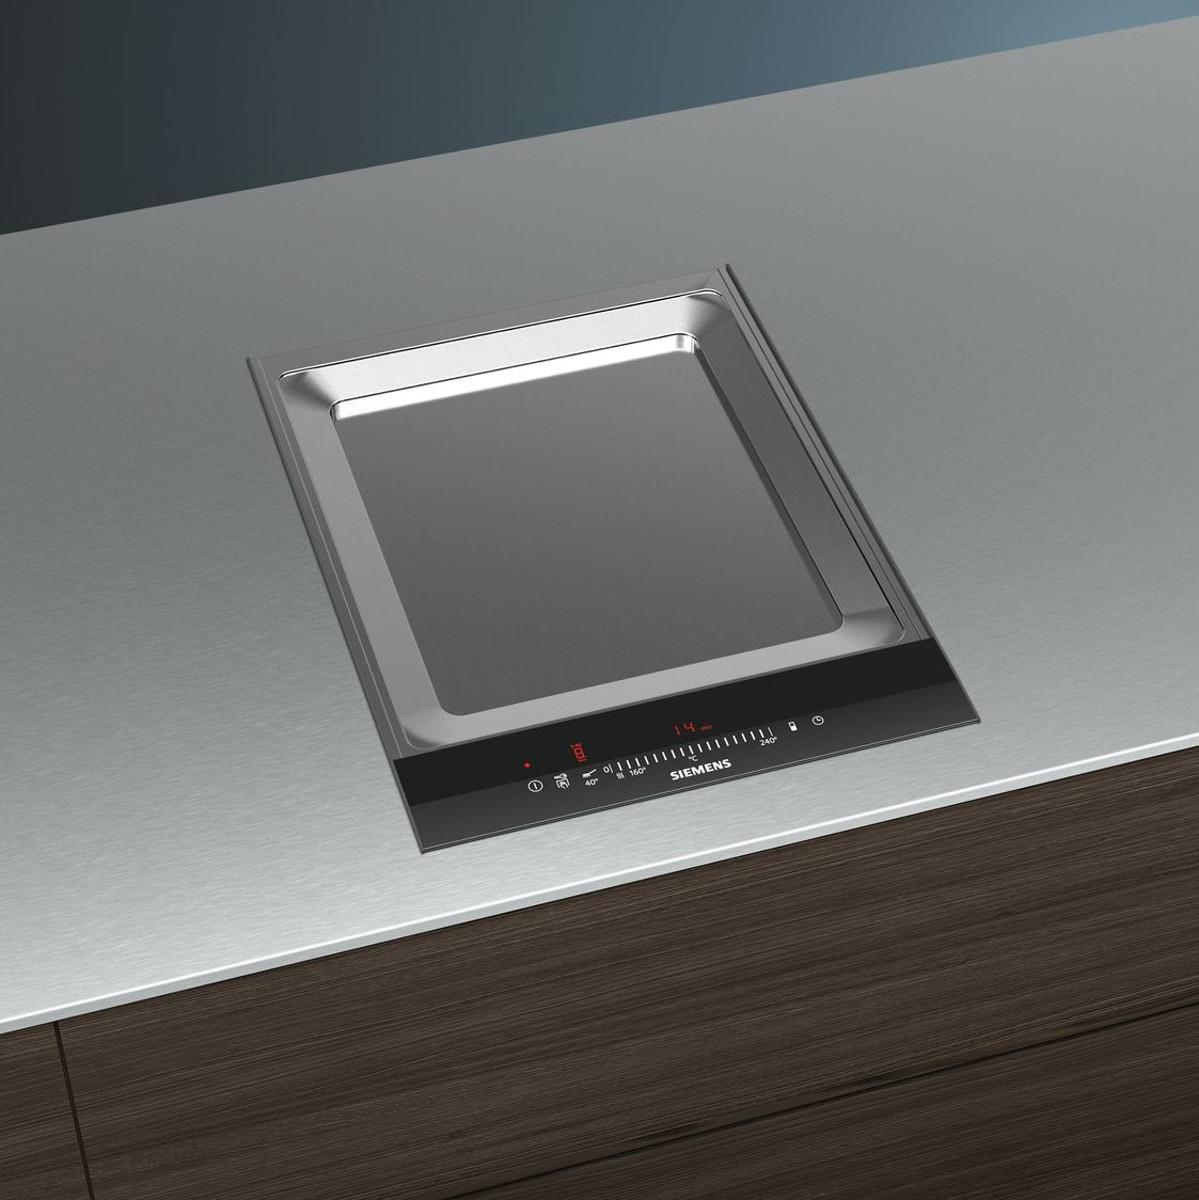 buy siemens et475fyb1e iq500 392 mm domino teppan yaki. Black Bedroom Furniture Sets. Home Design Ideas